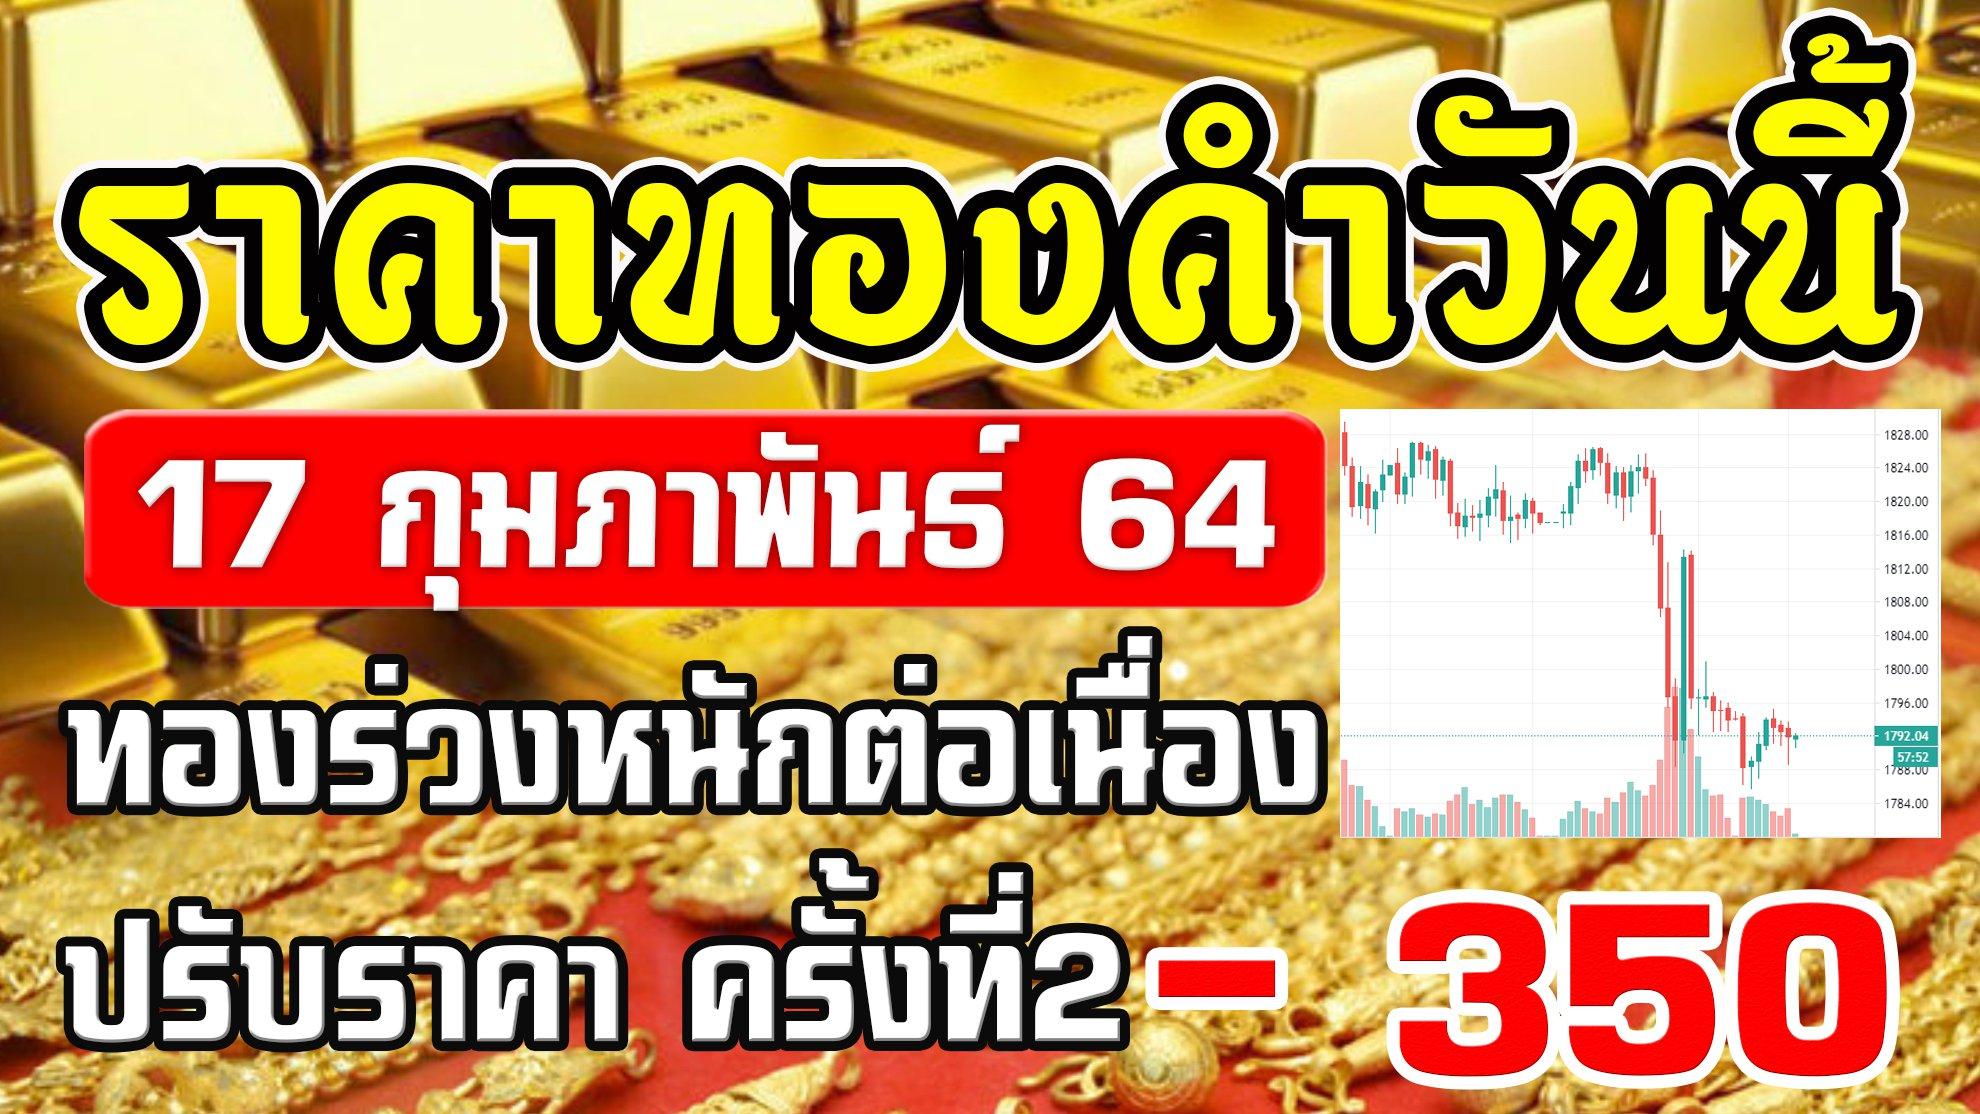 LIVEราคาทองวันนี้ 17/2/64 ทองร่วงต่อเนื่องครั้งที่2 ราคาทองคำวันนี้ 17กุมภาพันธ์64 อัพเดทล่าสุด